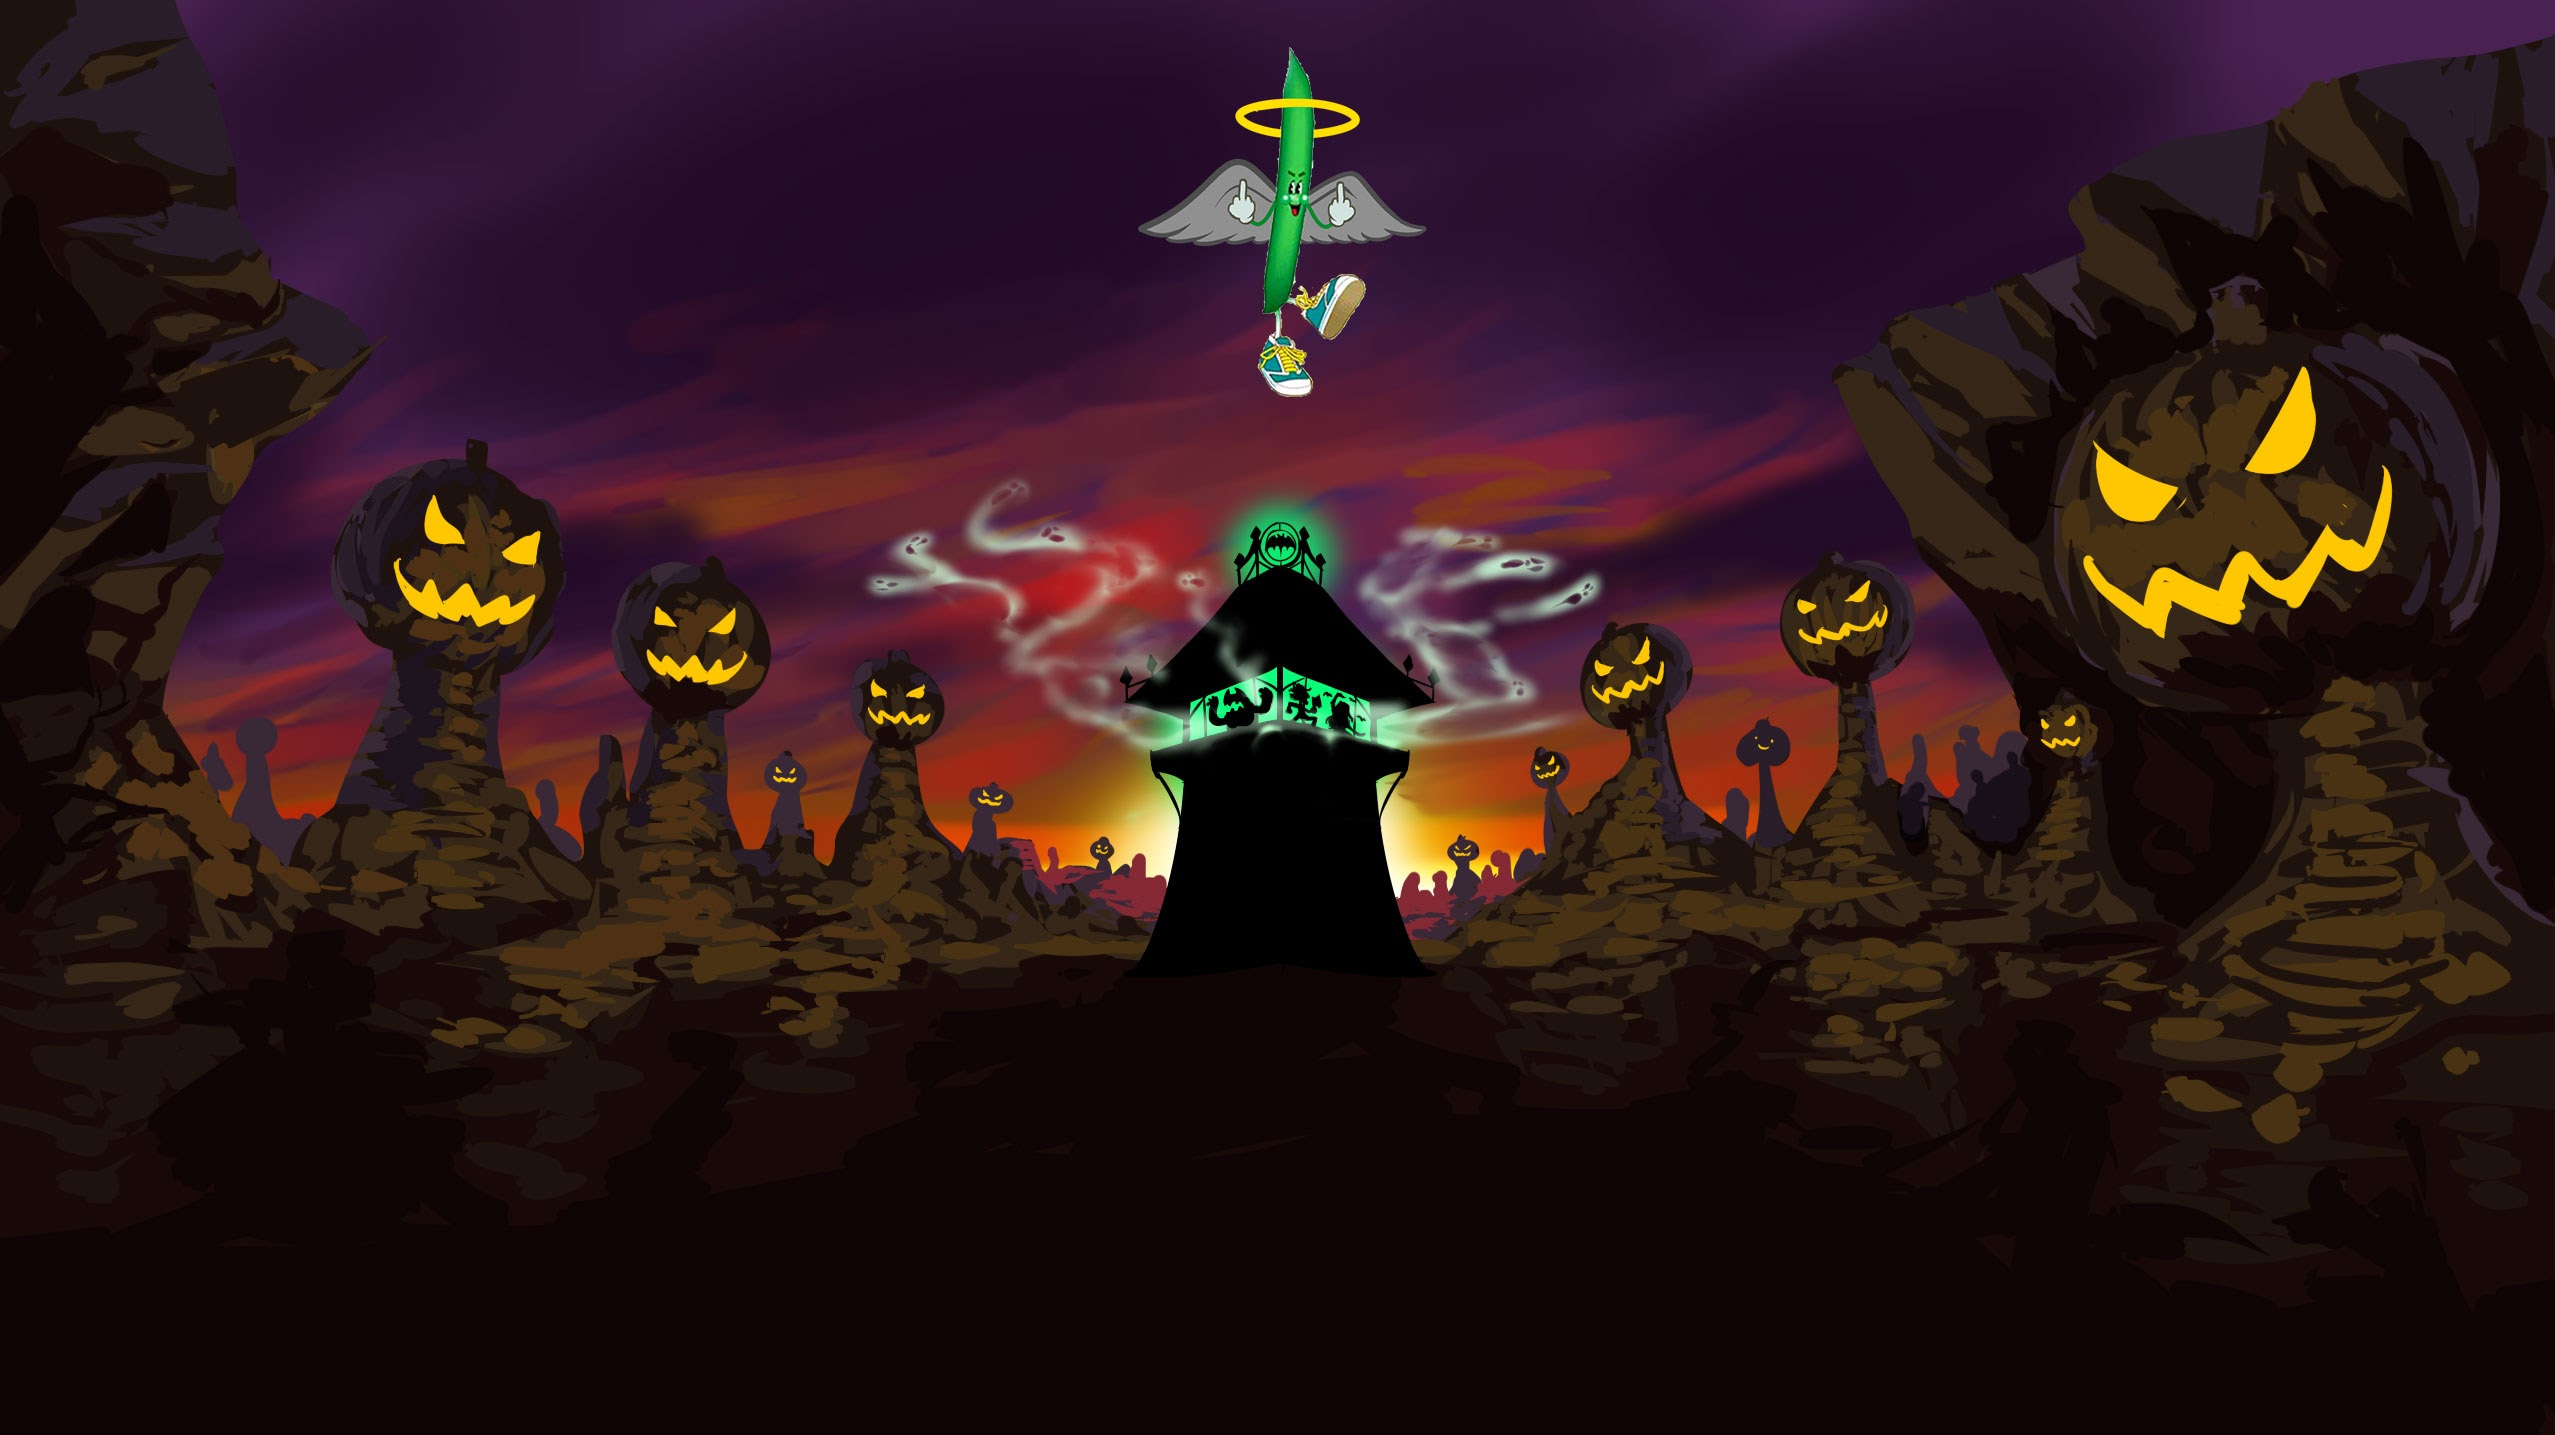 The SilvaGunner Spooktacular Halloween Horror Special